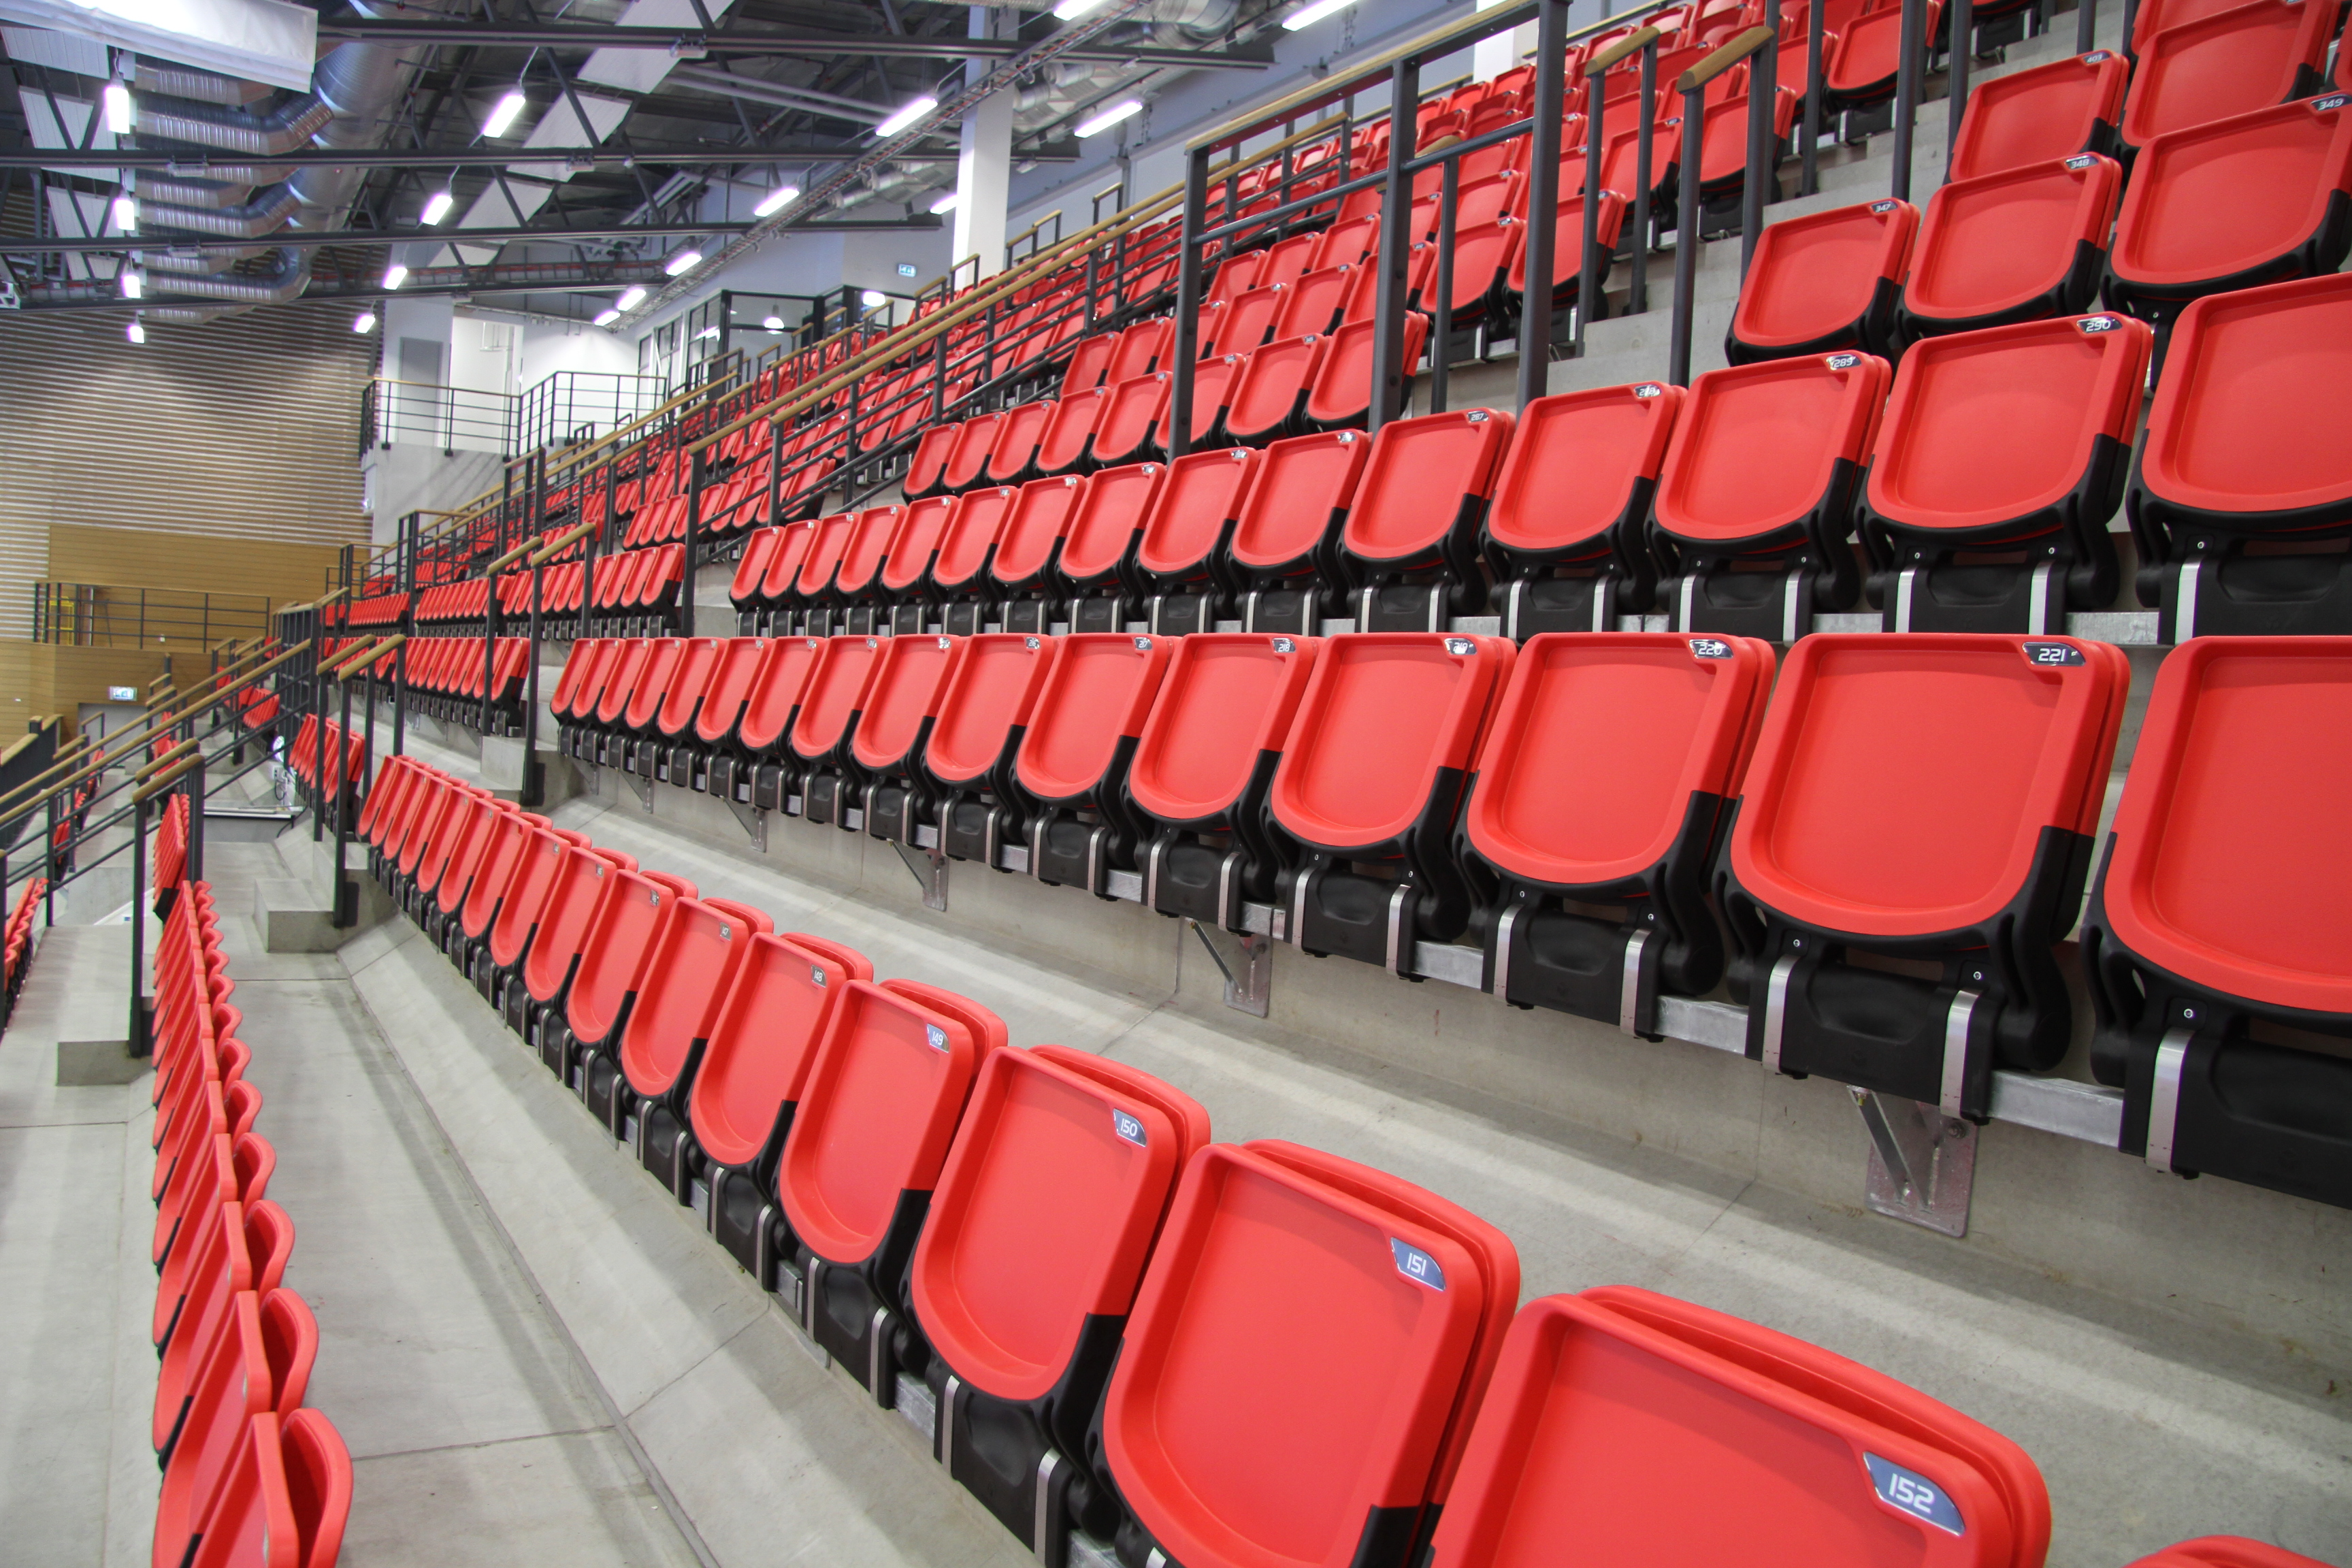 tribunestoler i plast fra unisport